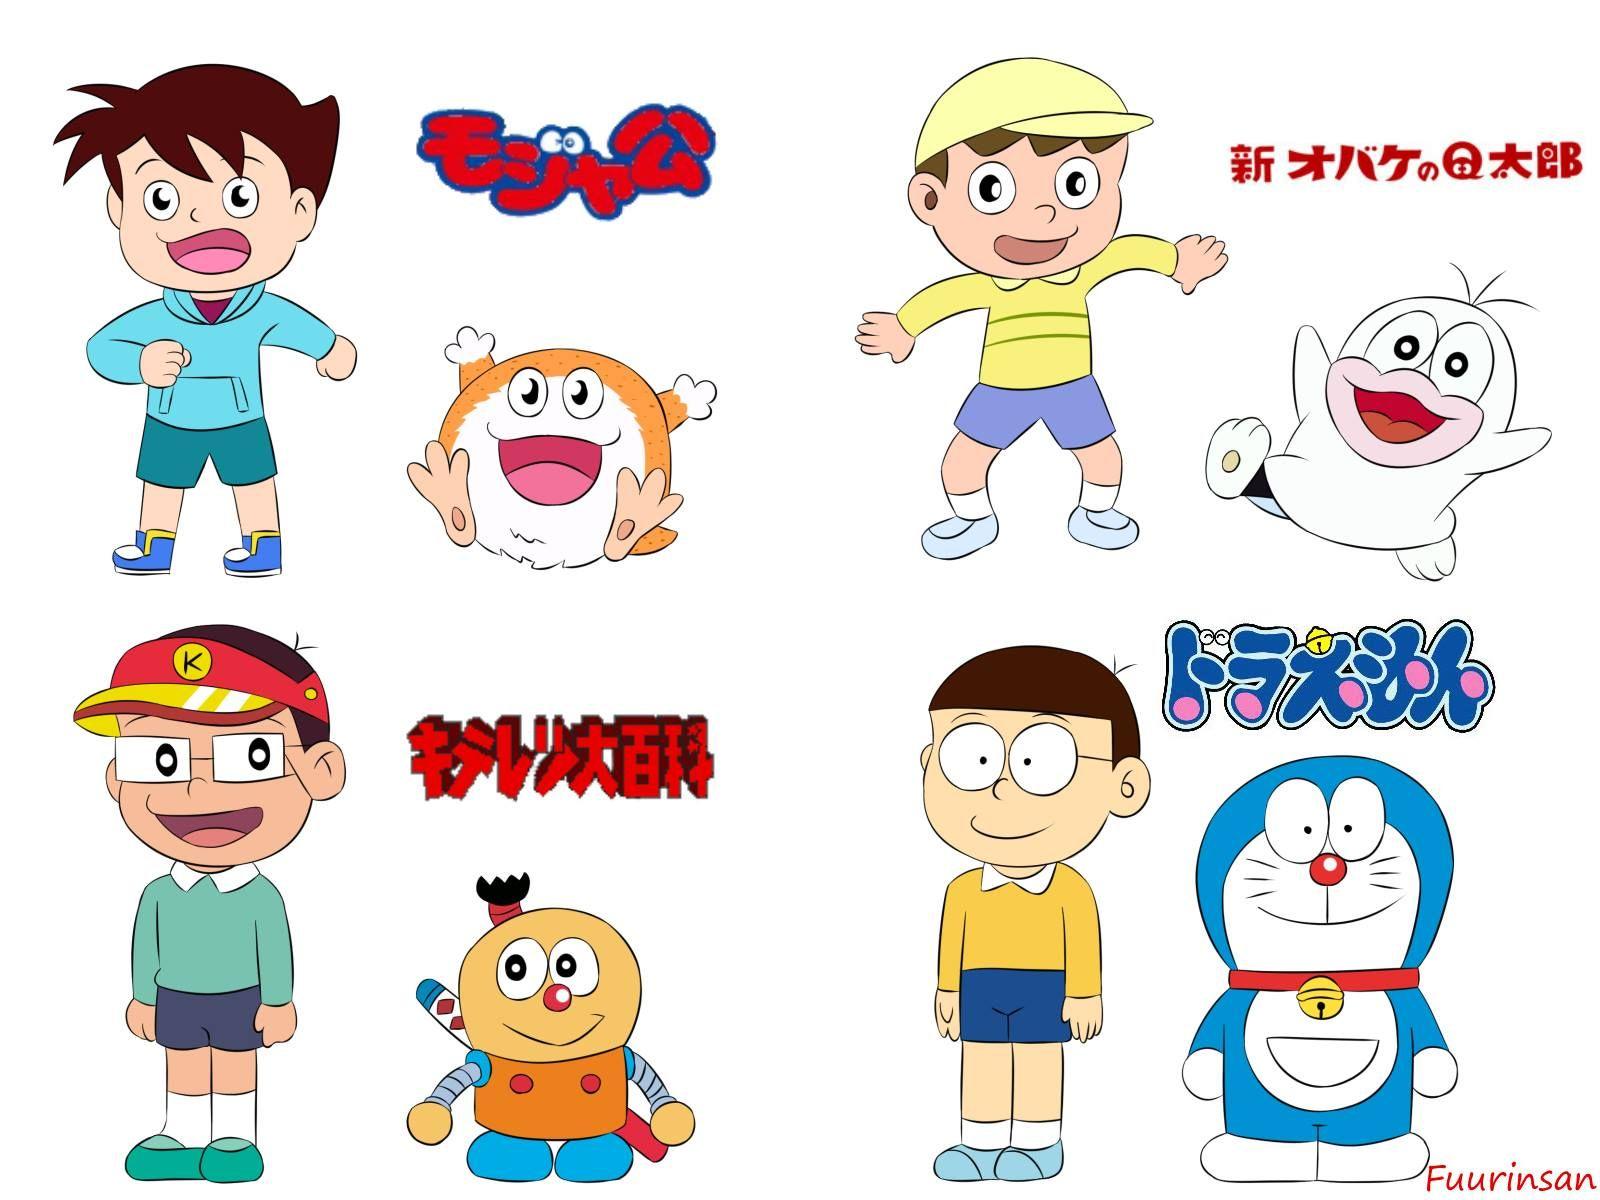 295. Old Anime 4 Amano Sorao & Mojara Ouhara Shouta & Q